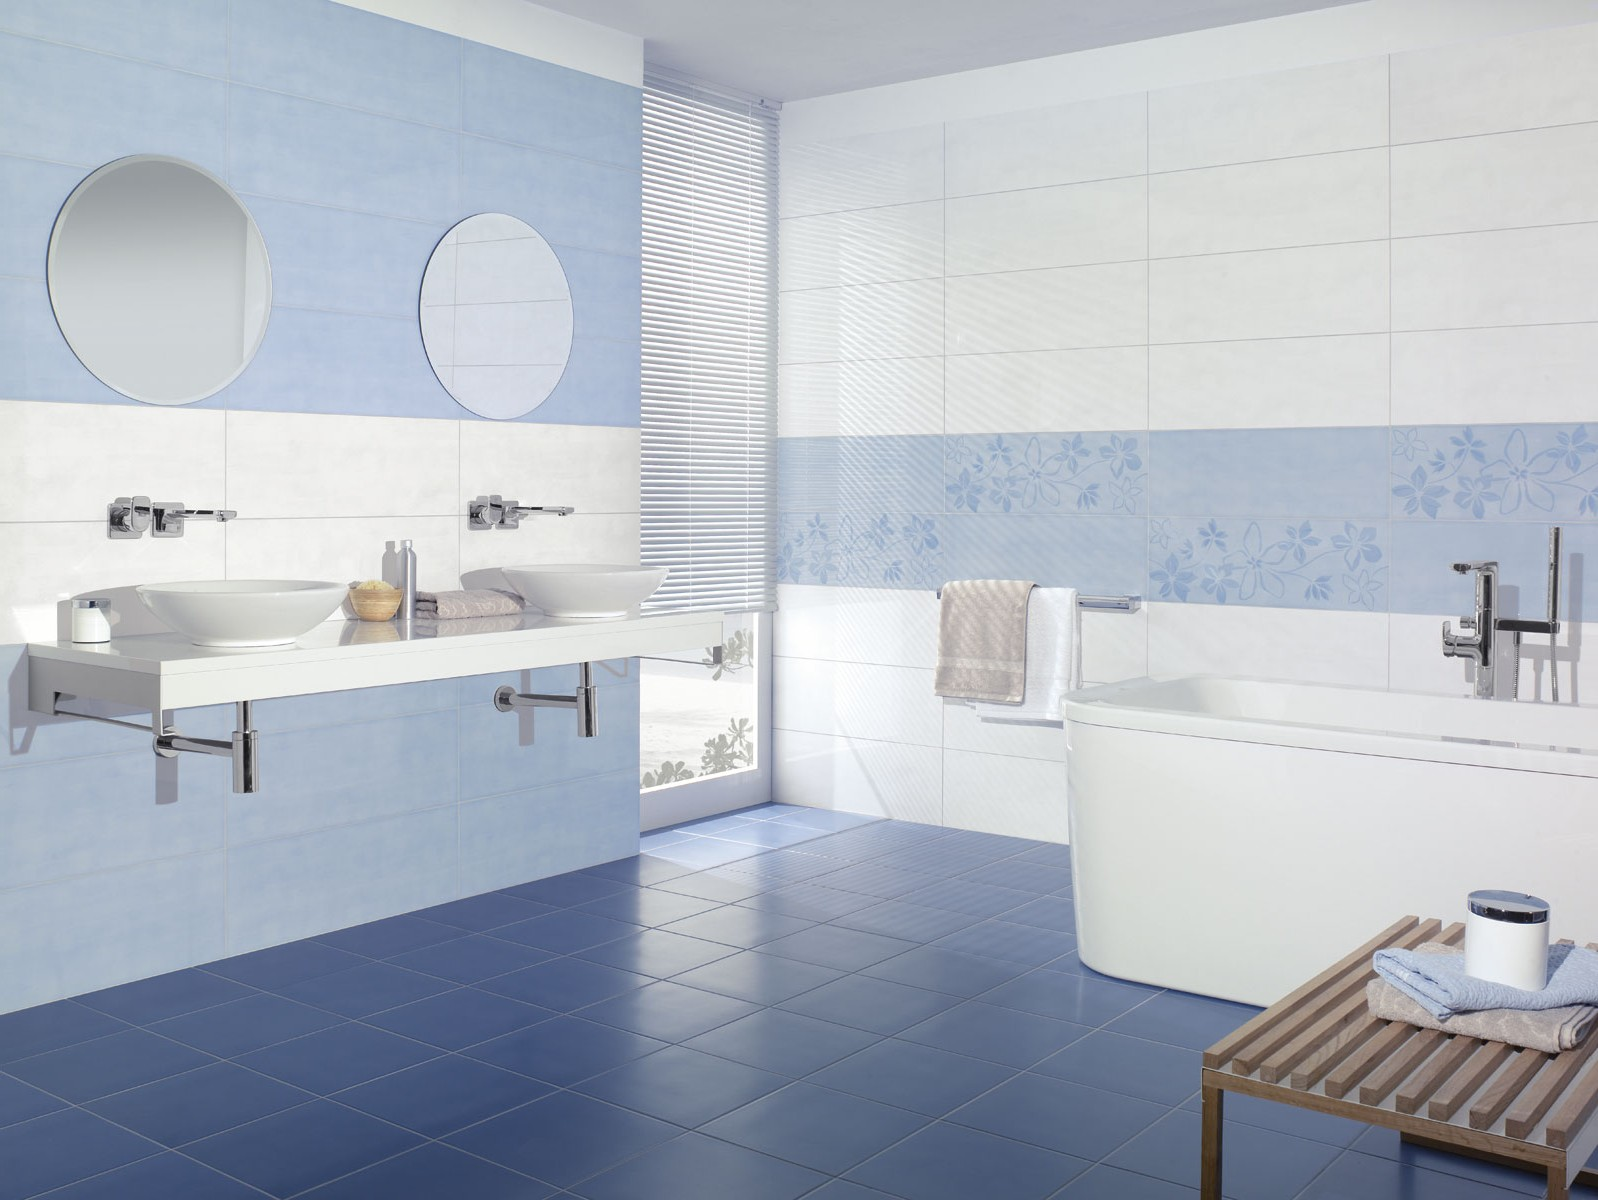 Carrelage salle de bain villeroy boch carrelage id es for Carrelage villeroy